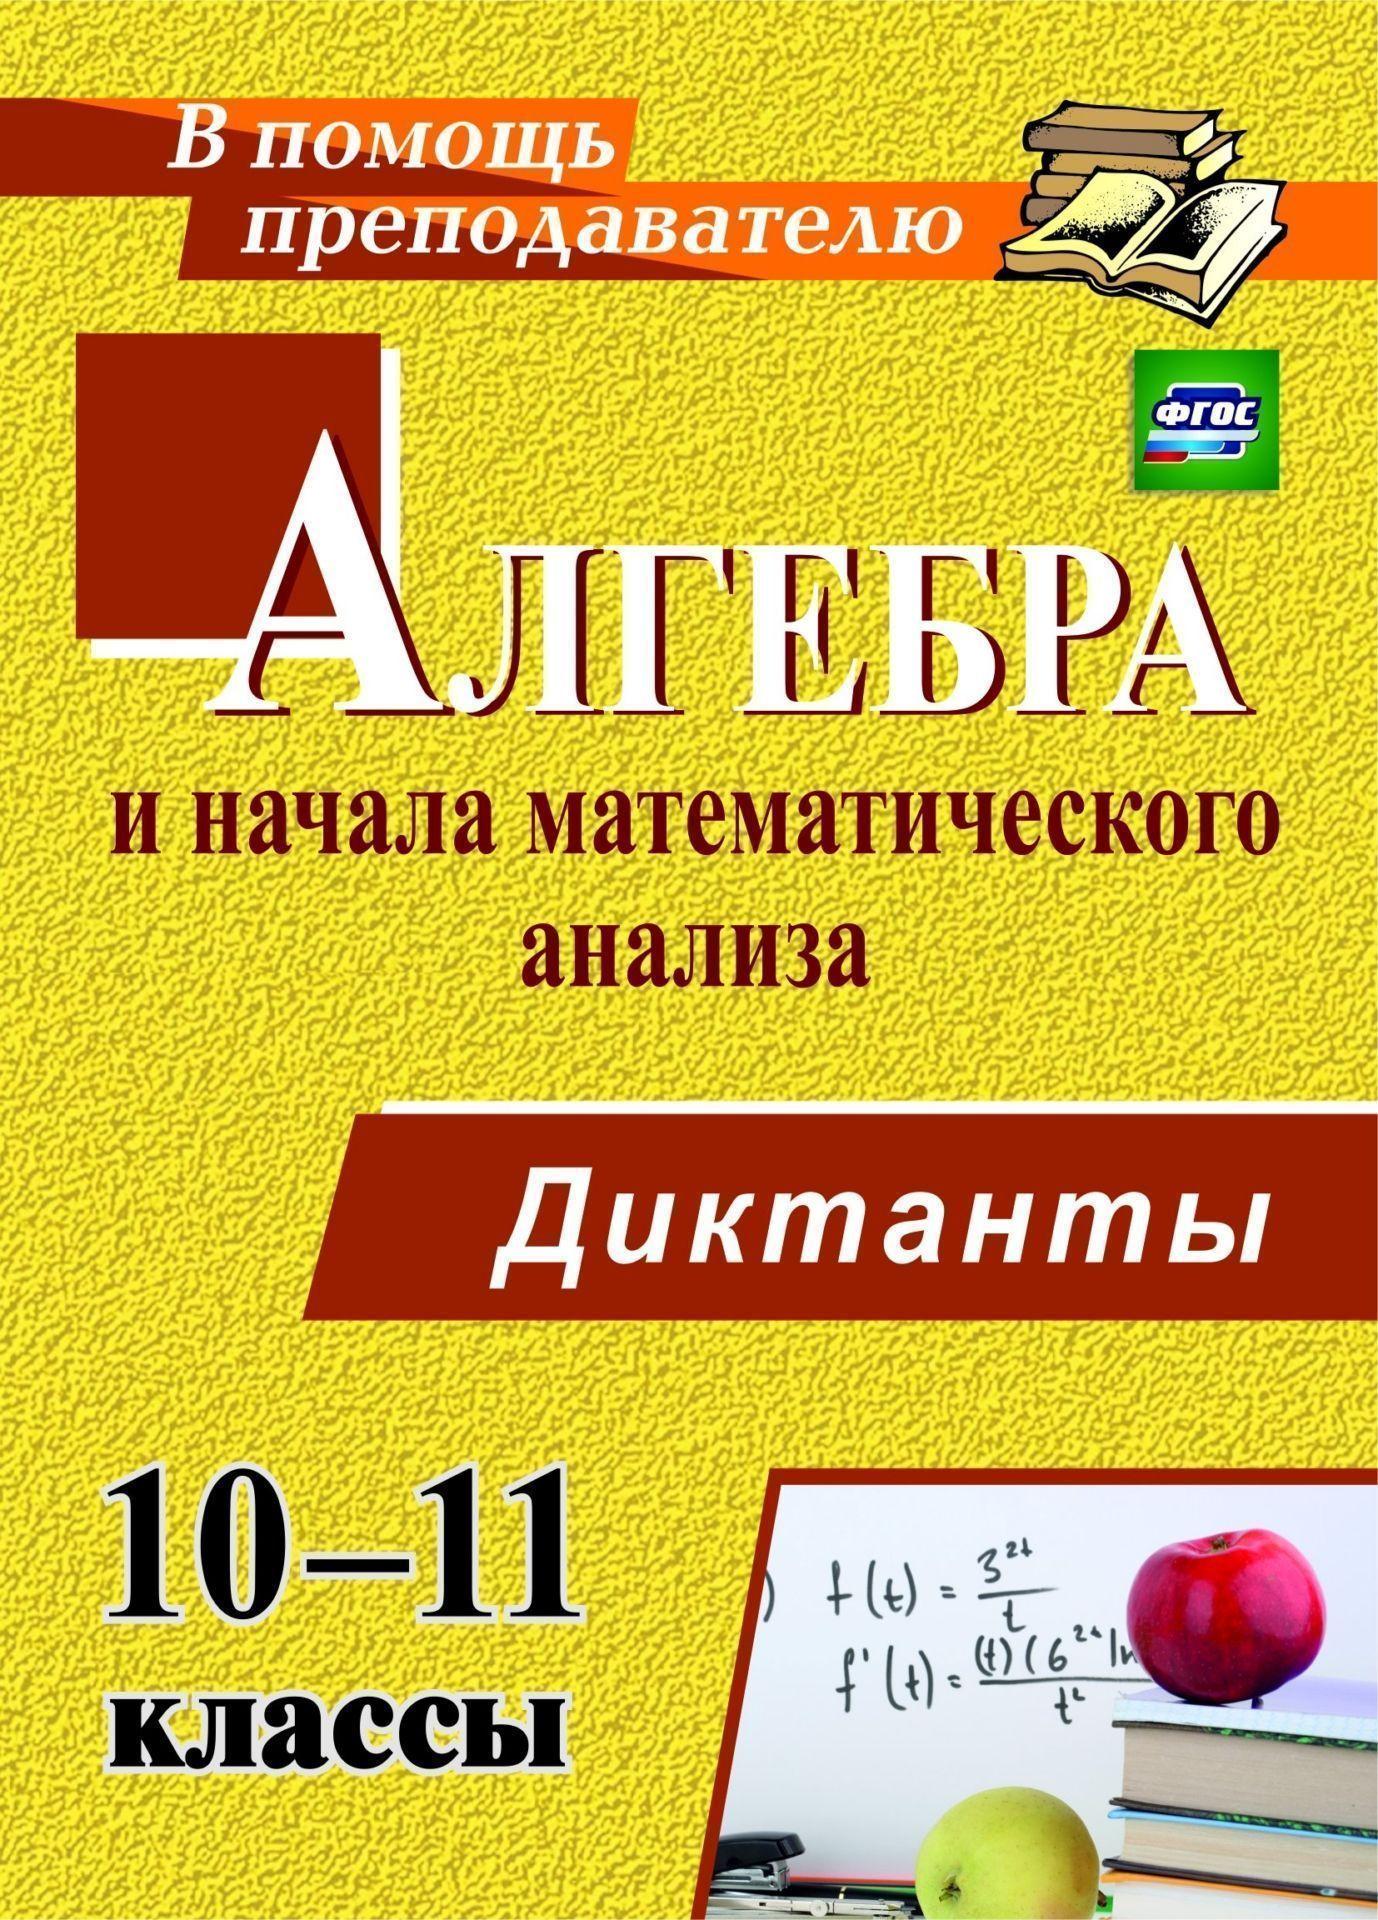 А. С. Конте Алгебра и начала математического анализа. 10-11 классы. Диктанты